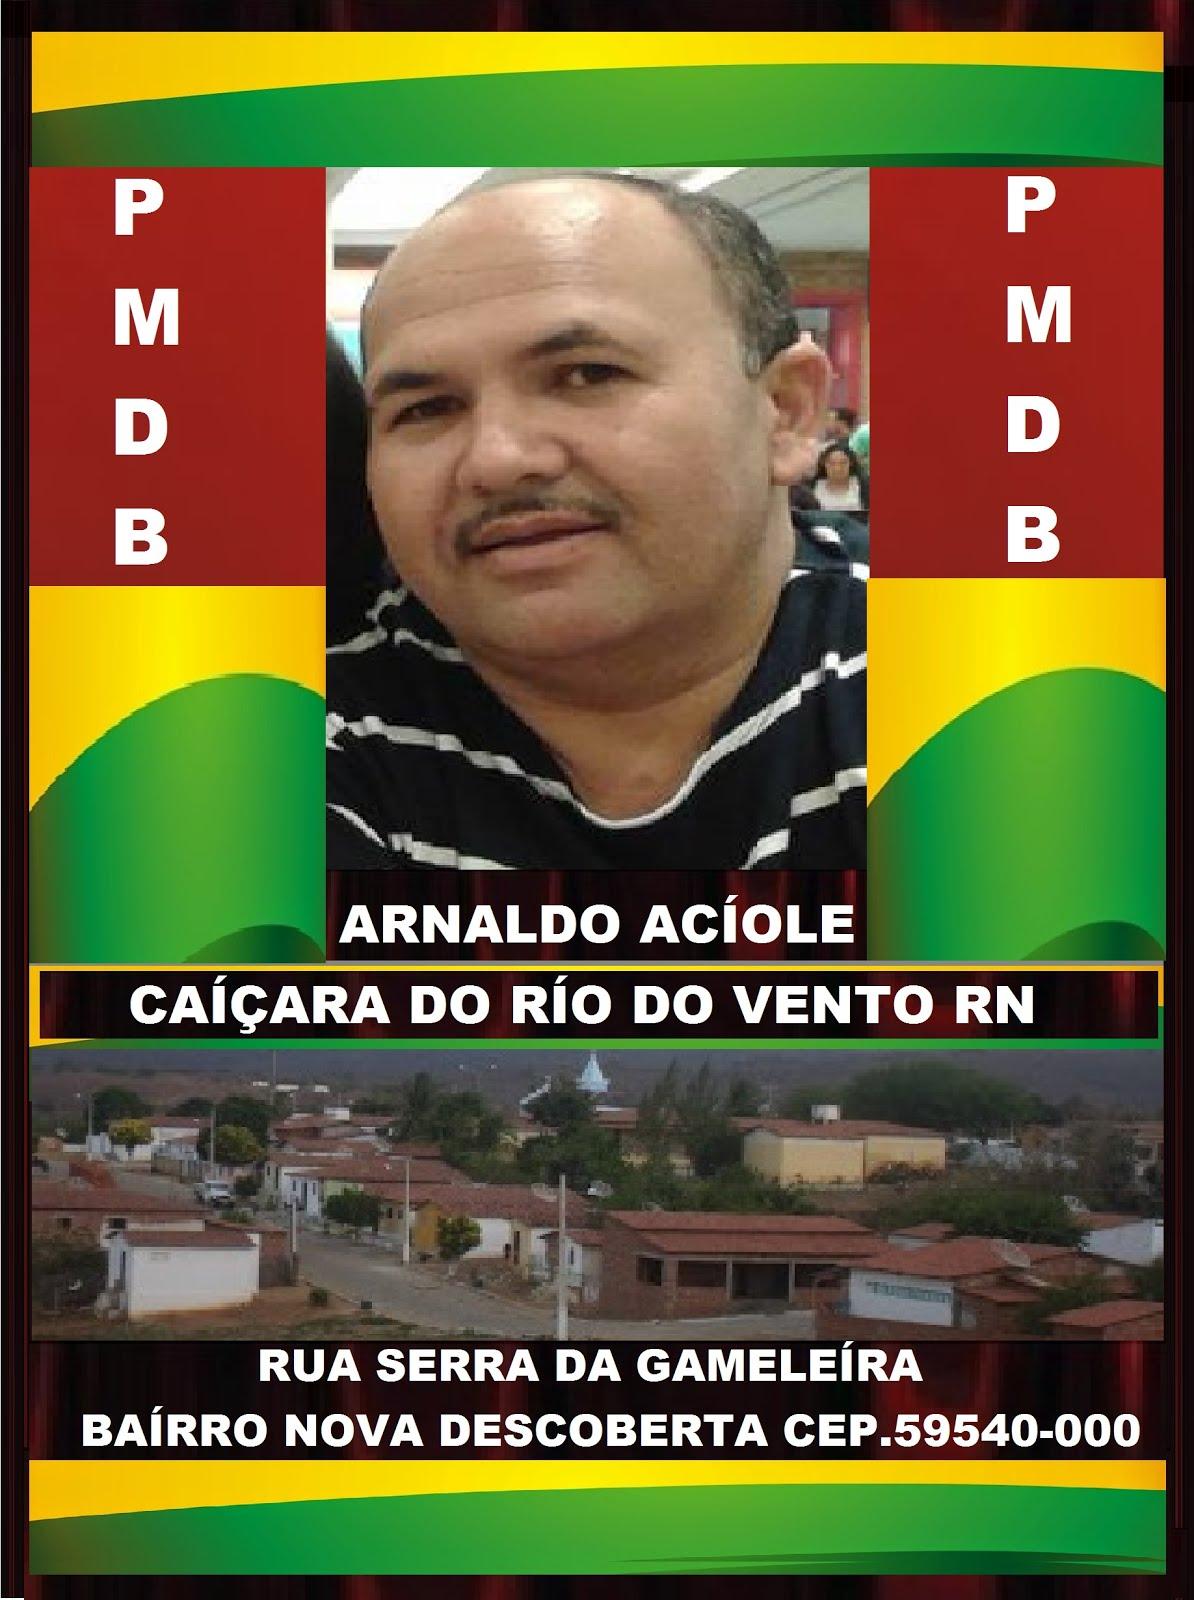 ARNALDO ACIOLE CAÍÇARA DO RÍO DO VENTO.RN